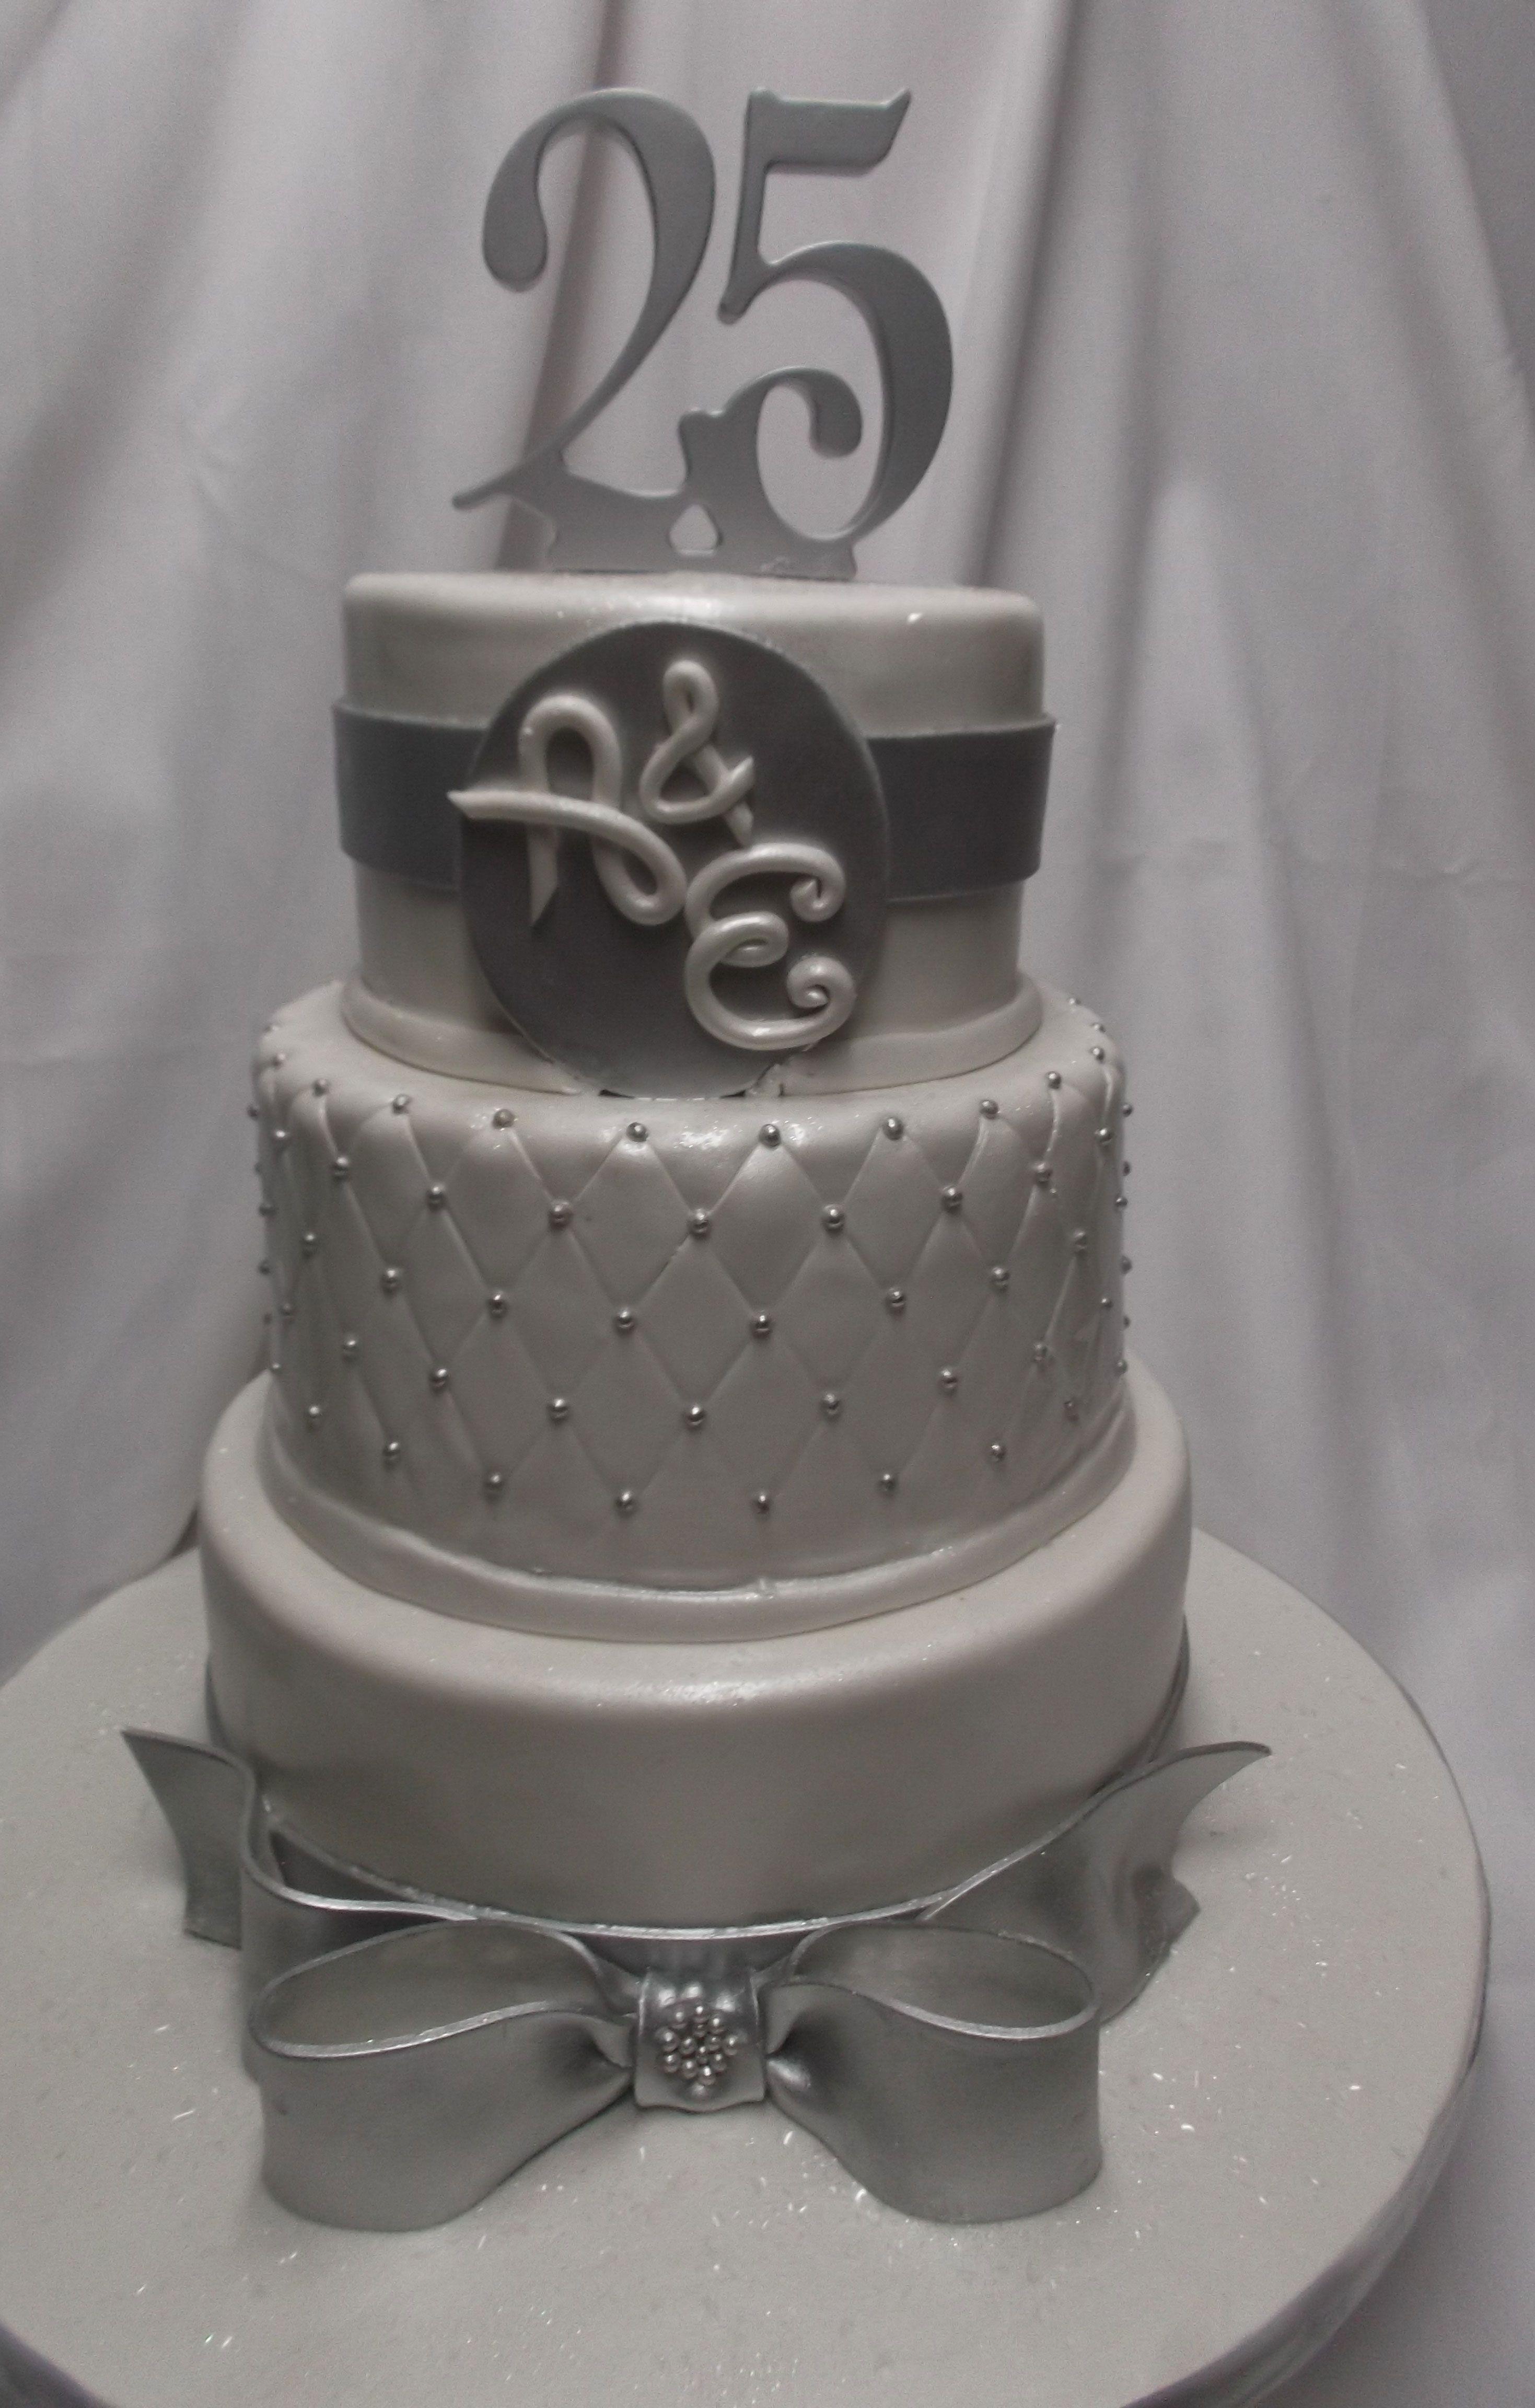 25th Wedding Anniversary Gifts Pinterest : 25th wedding anniversary decorations 25th Anniversary ( 1 ...